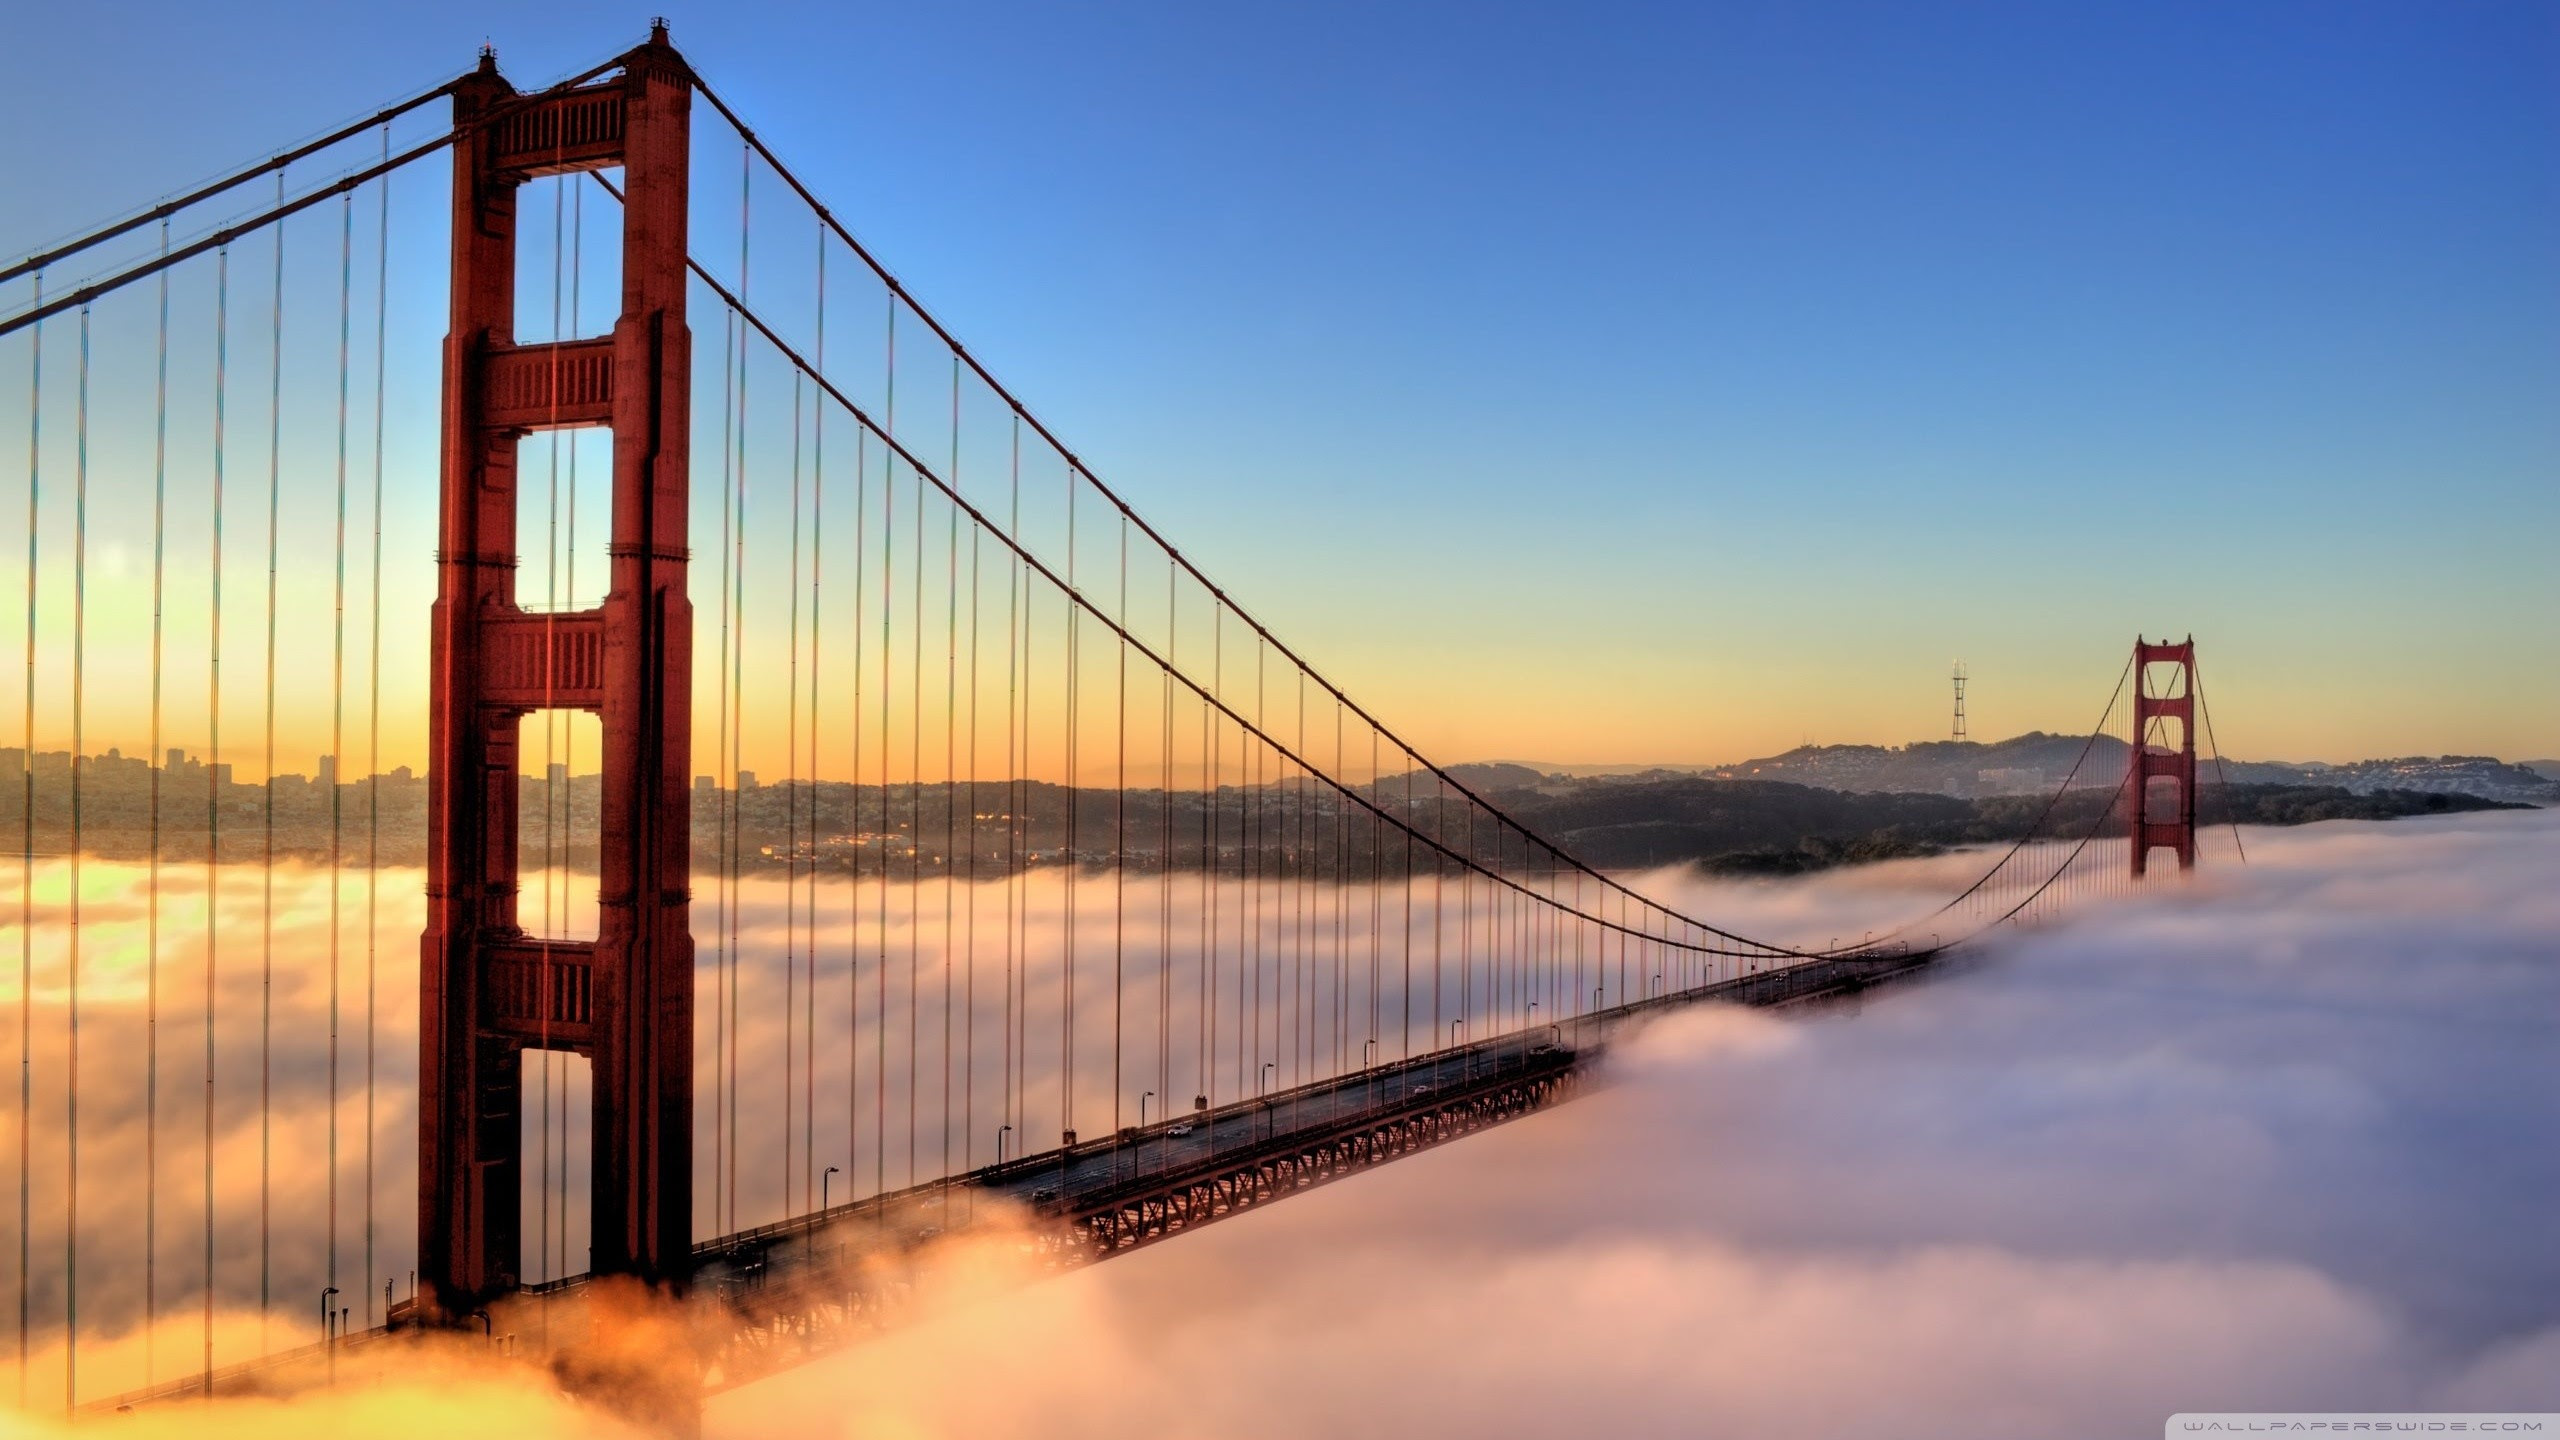 Golden Gate Bridge Wallpaper Hd 74 Images